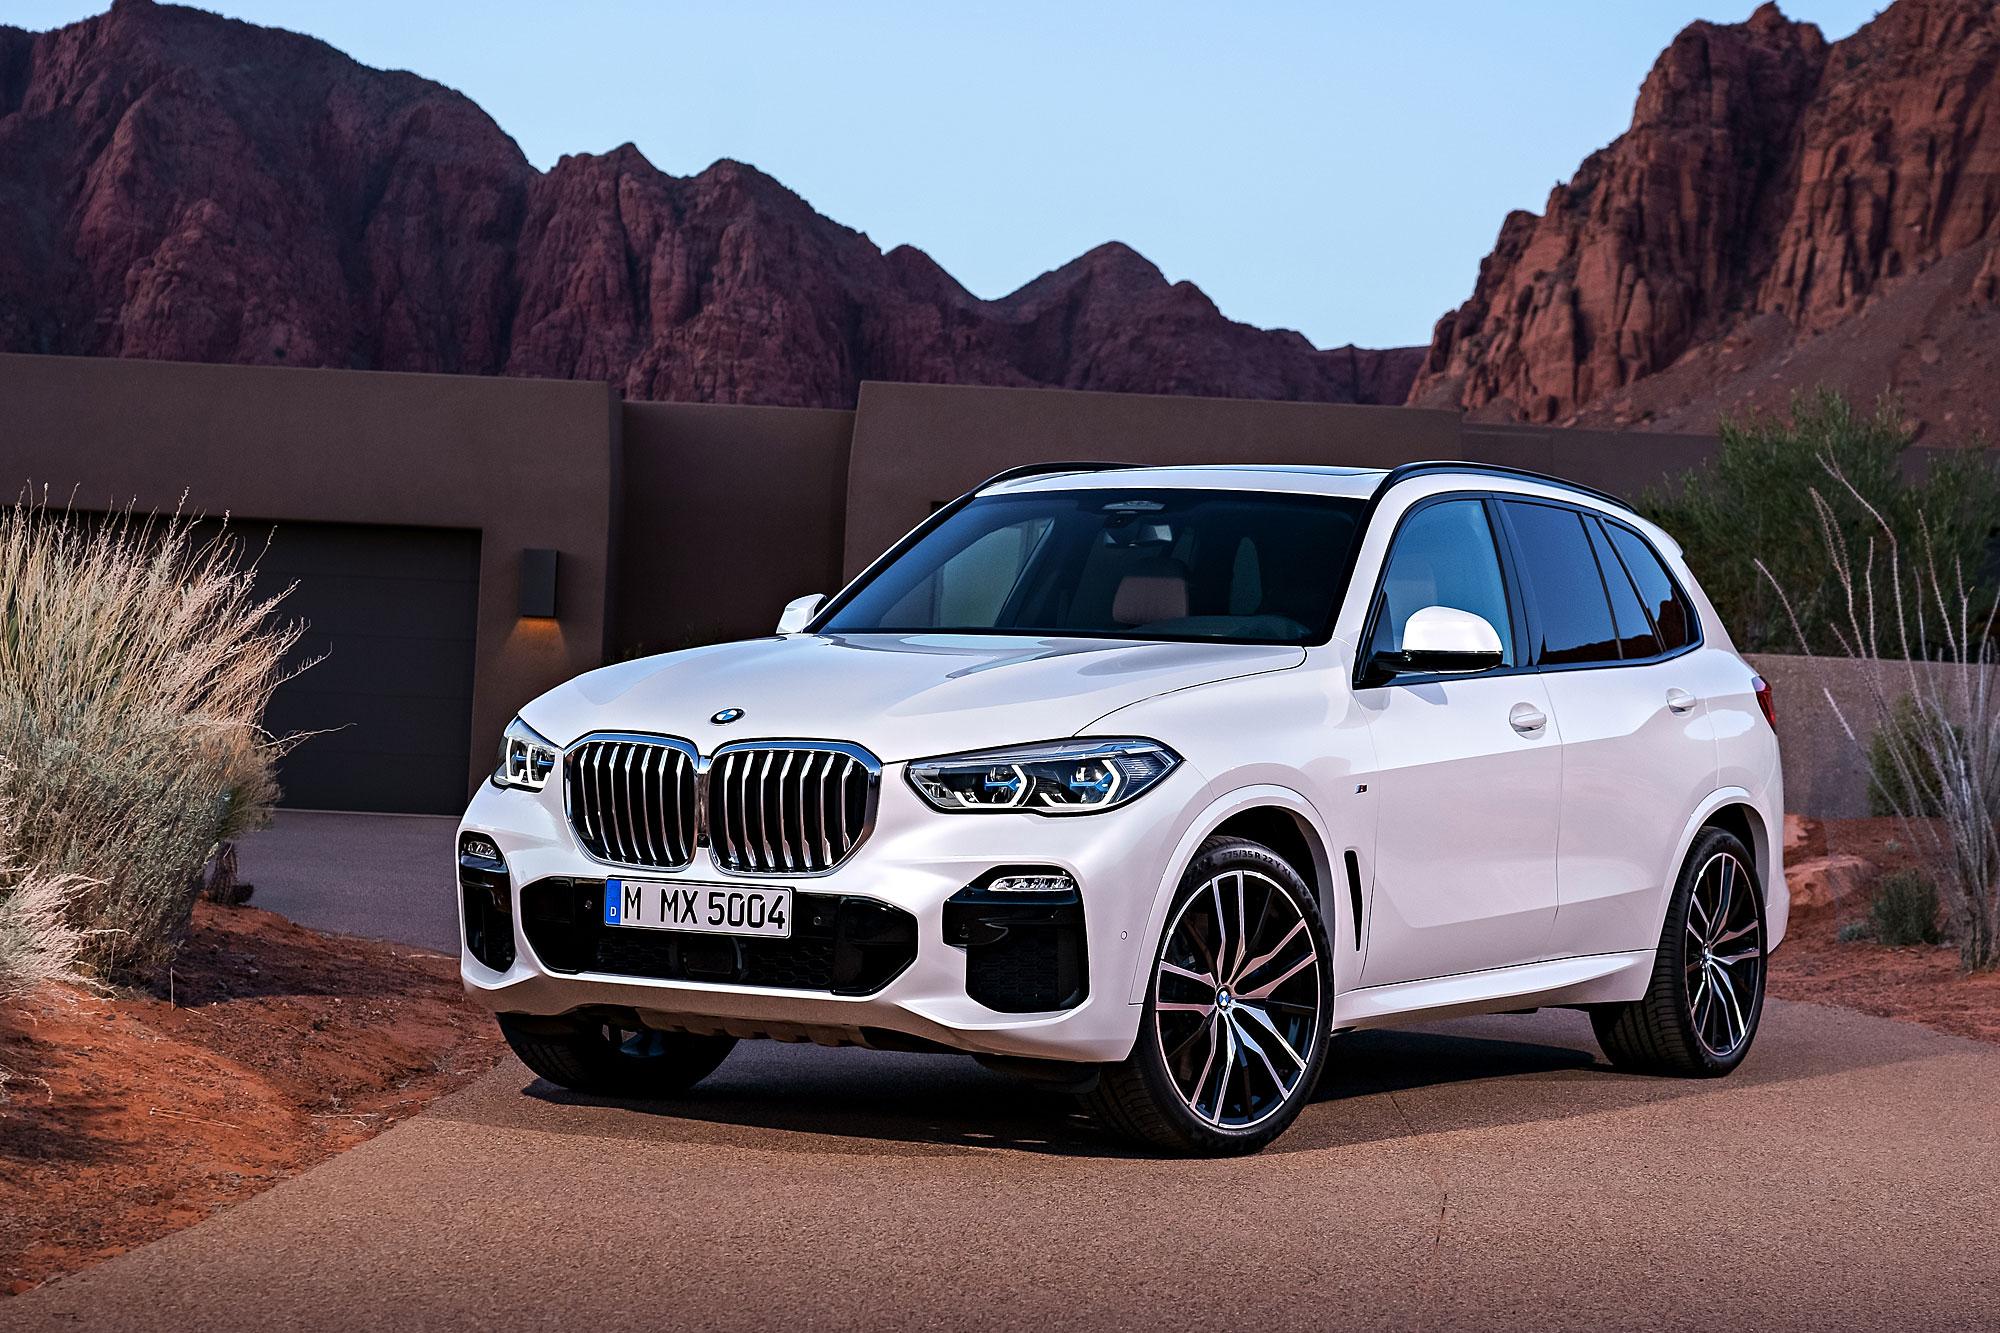 BMW 針對 X5 與 X6 推出整合 48V MHEV 系統的 xDrive40d 柴油動力。